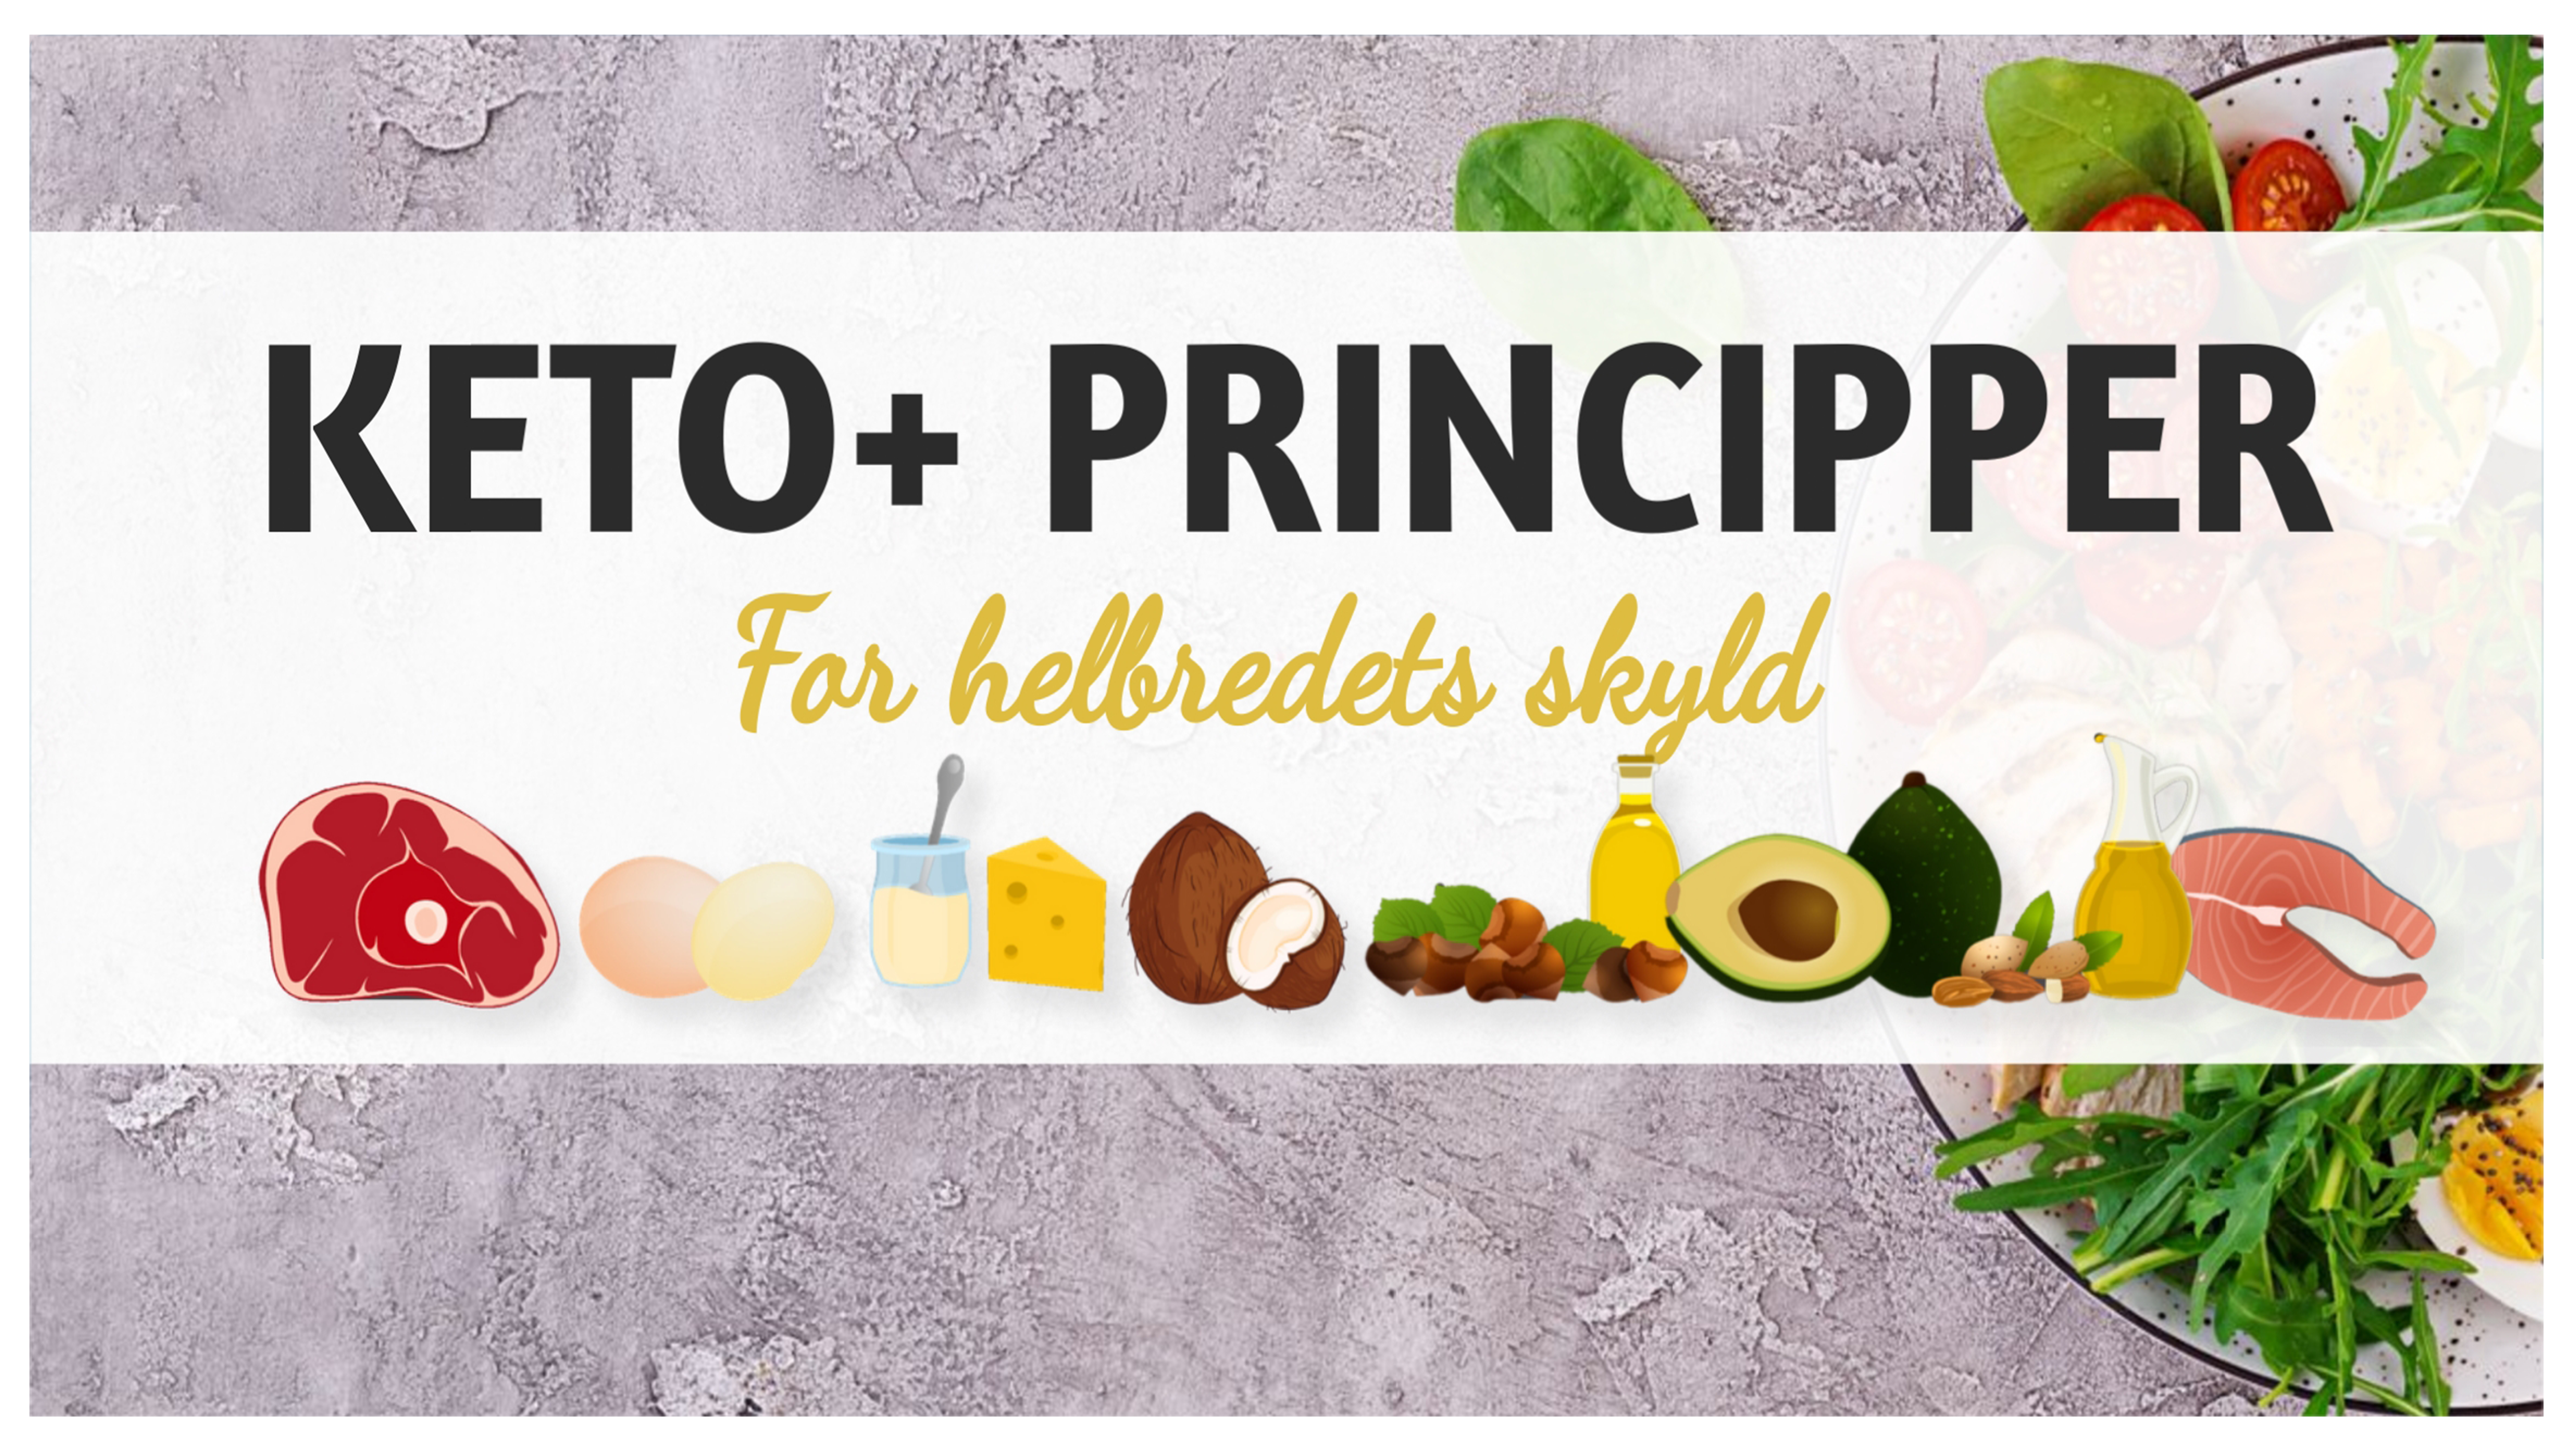 ketoliv-menu-artikler-ketoplusprincipper